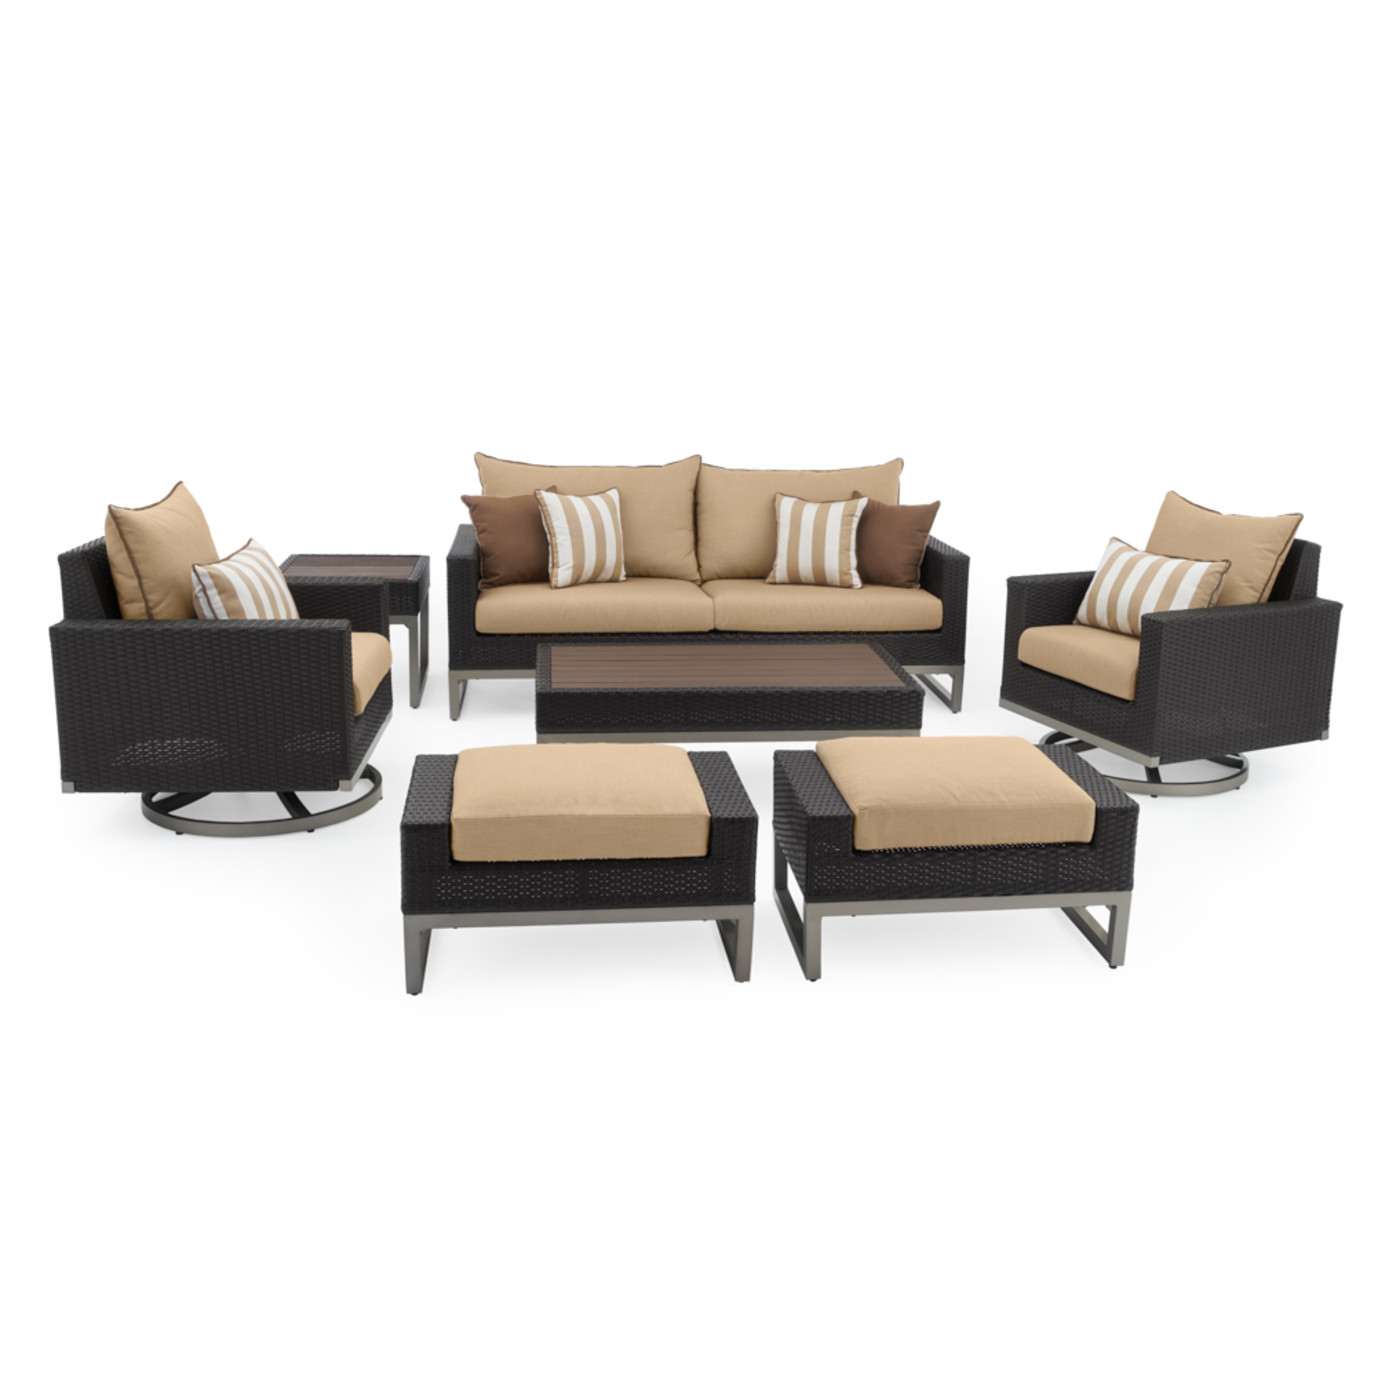 Milo™ Espresso 7pc Motion Deep Seating Set - Maxim Beige